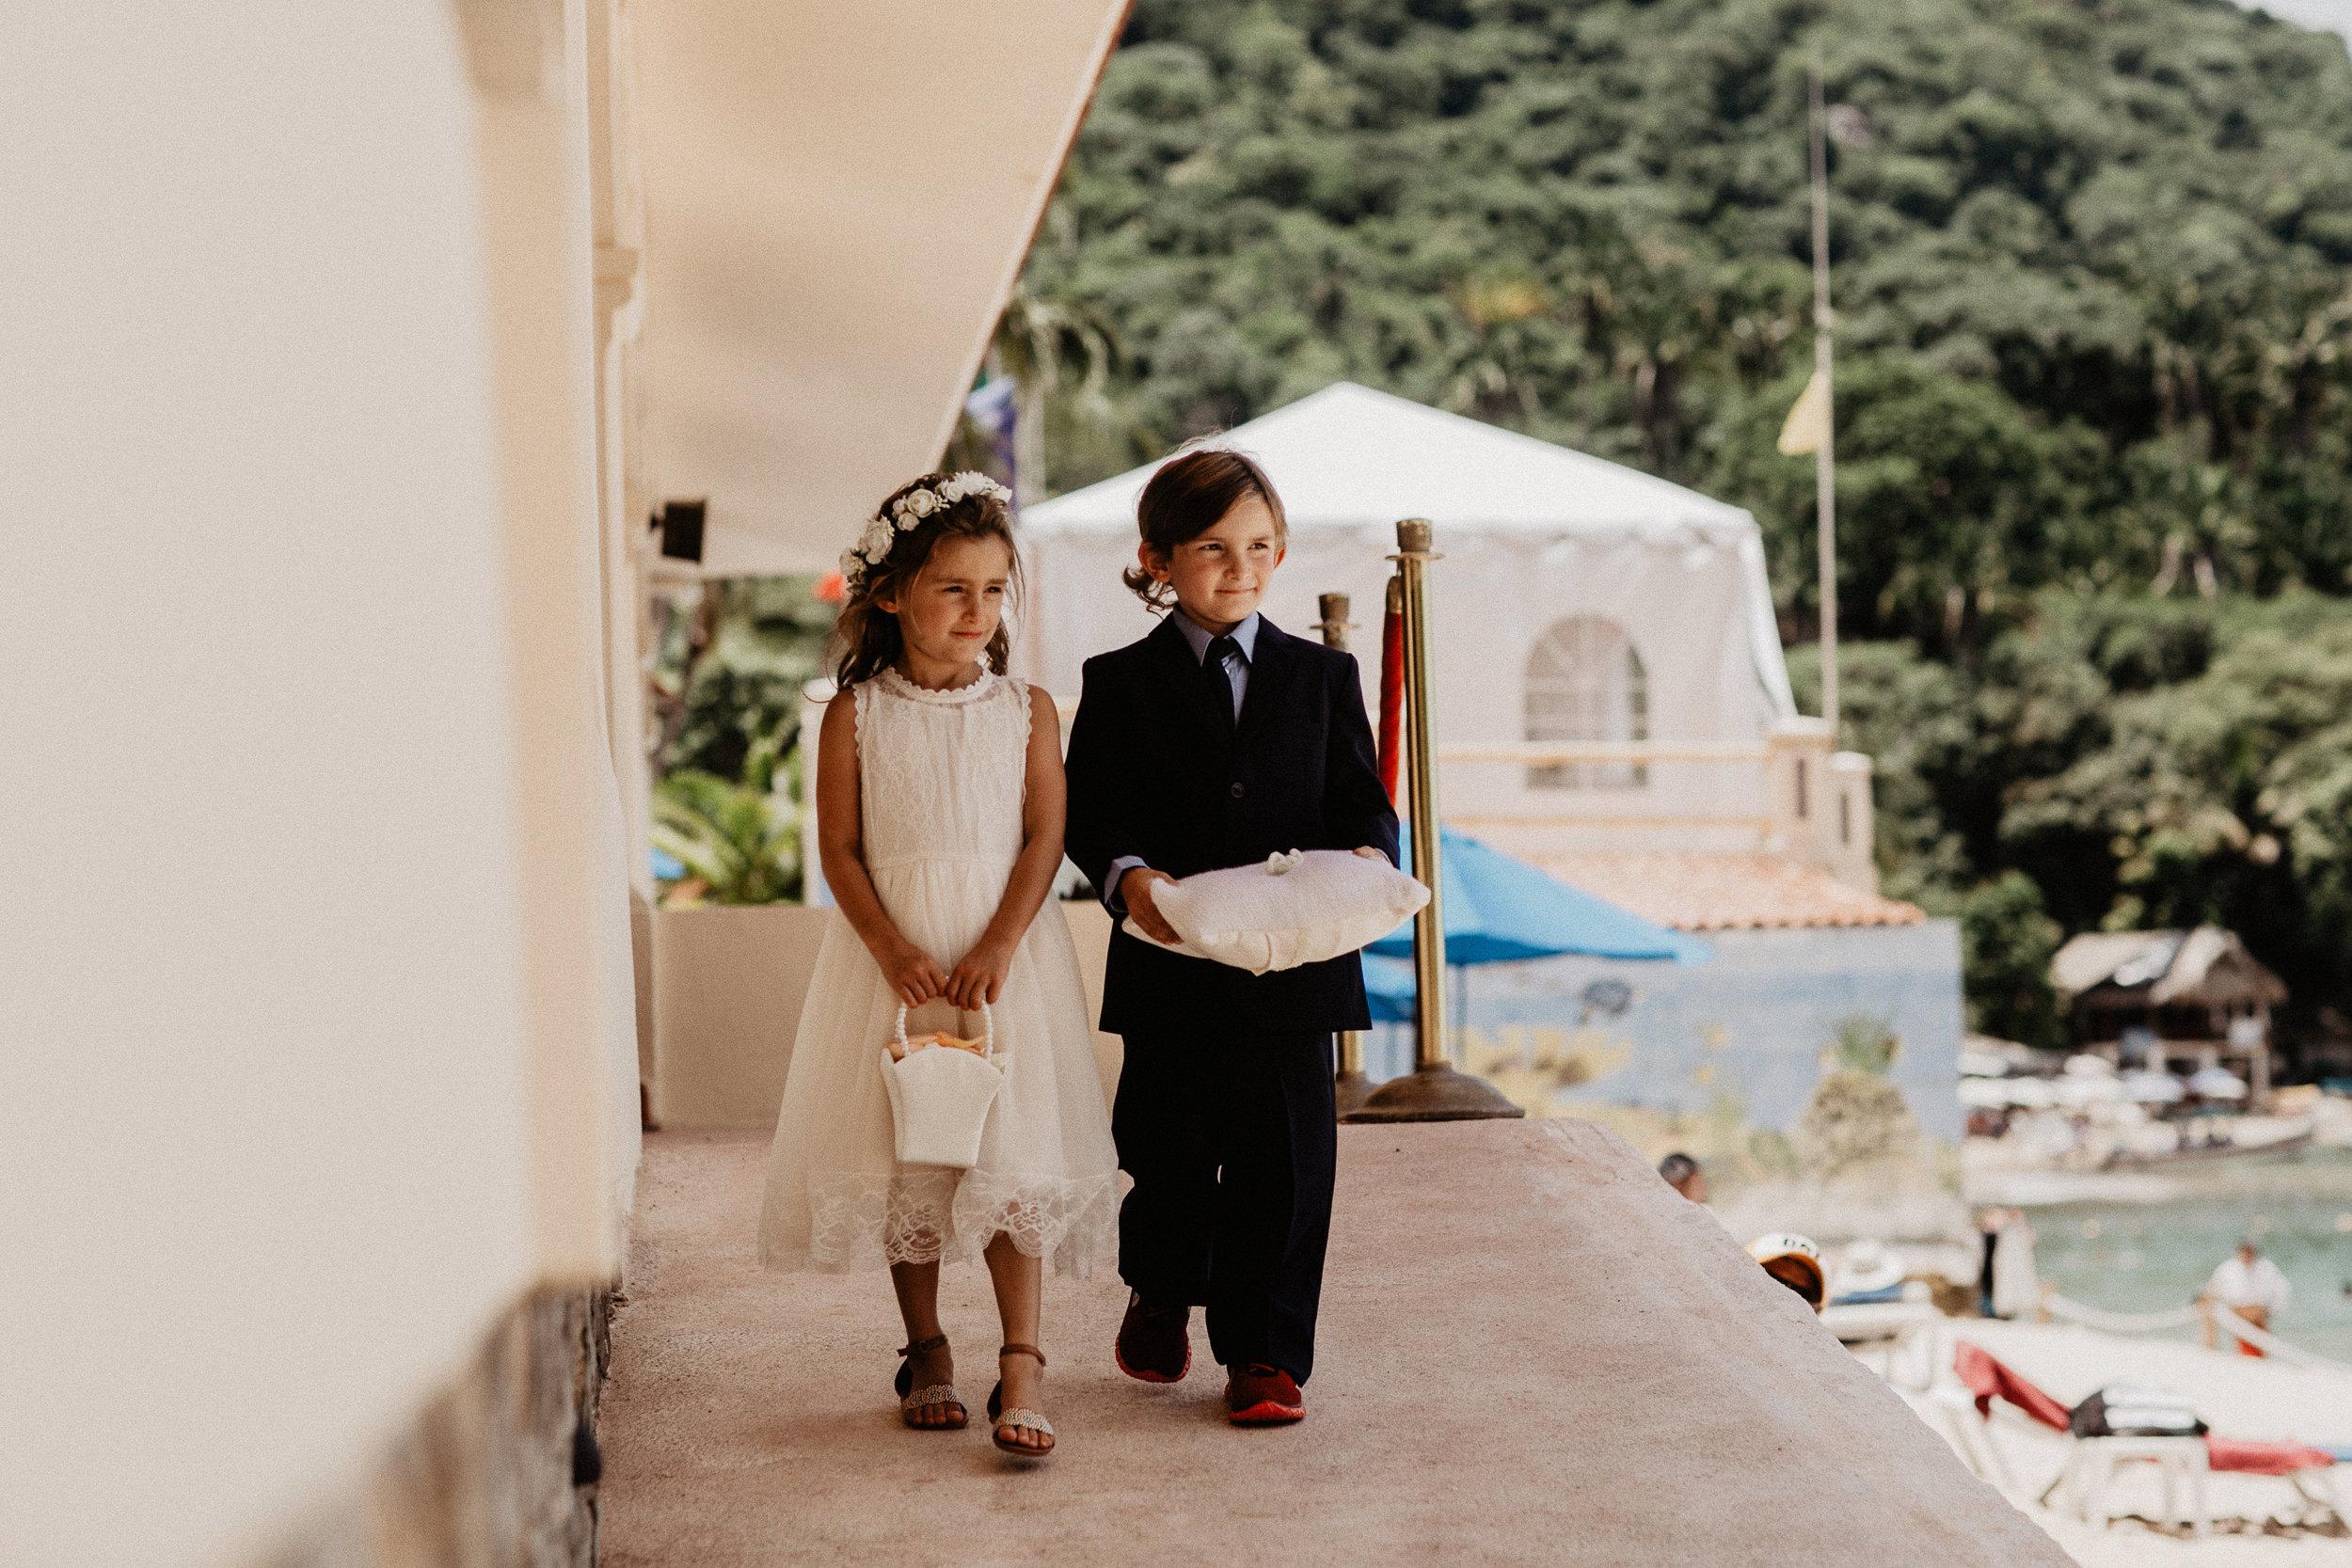 alfonso_flores_destination_wedding_photography_puerto_vallarta_hotel_barcelo_vallarta_cuttler_amela-208.JPG